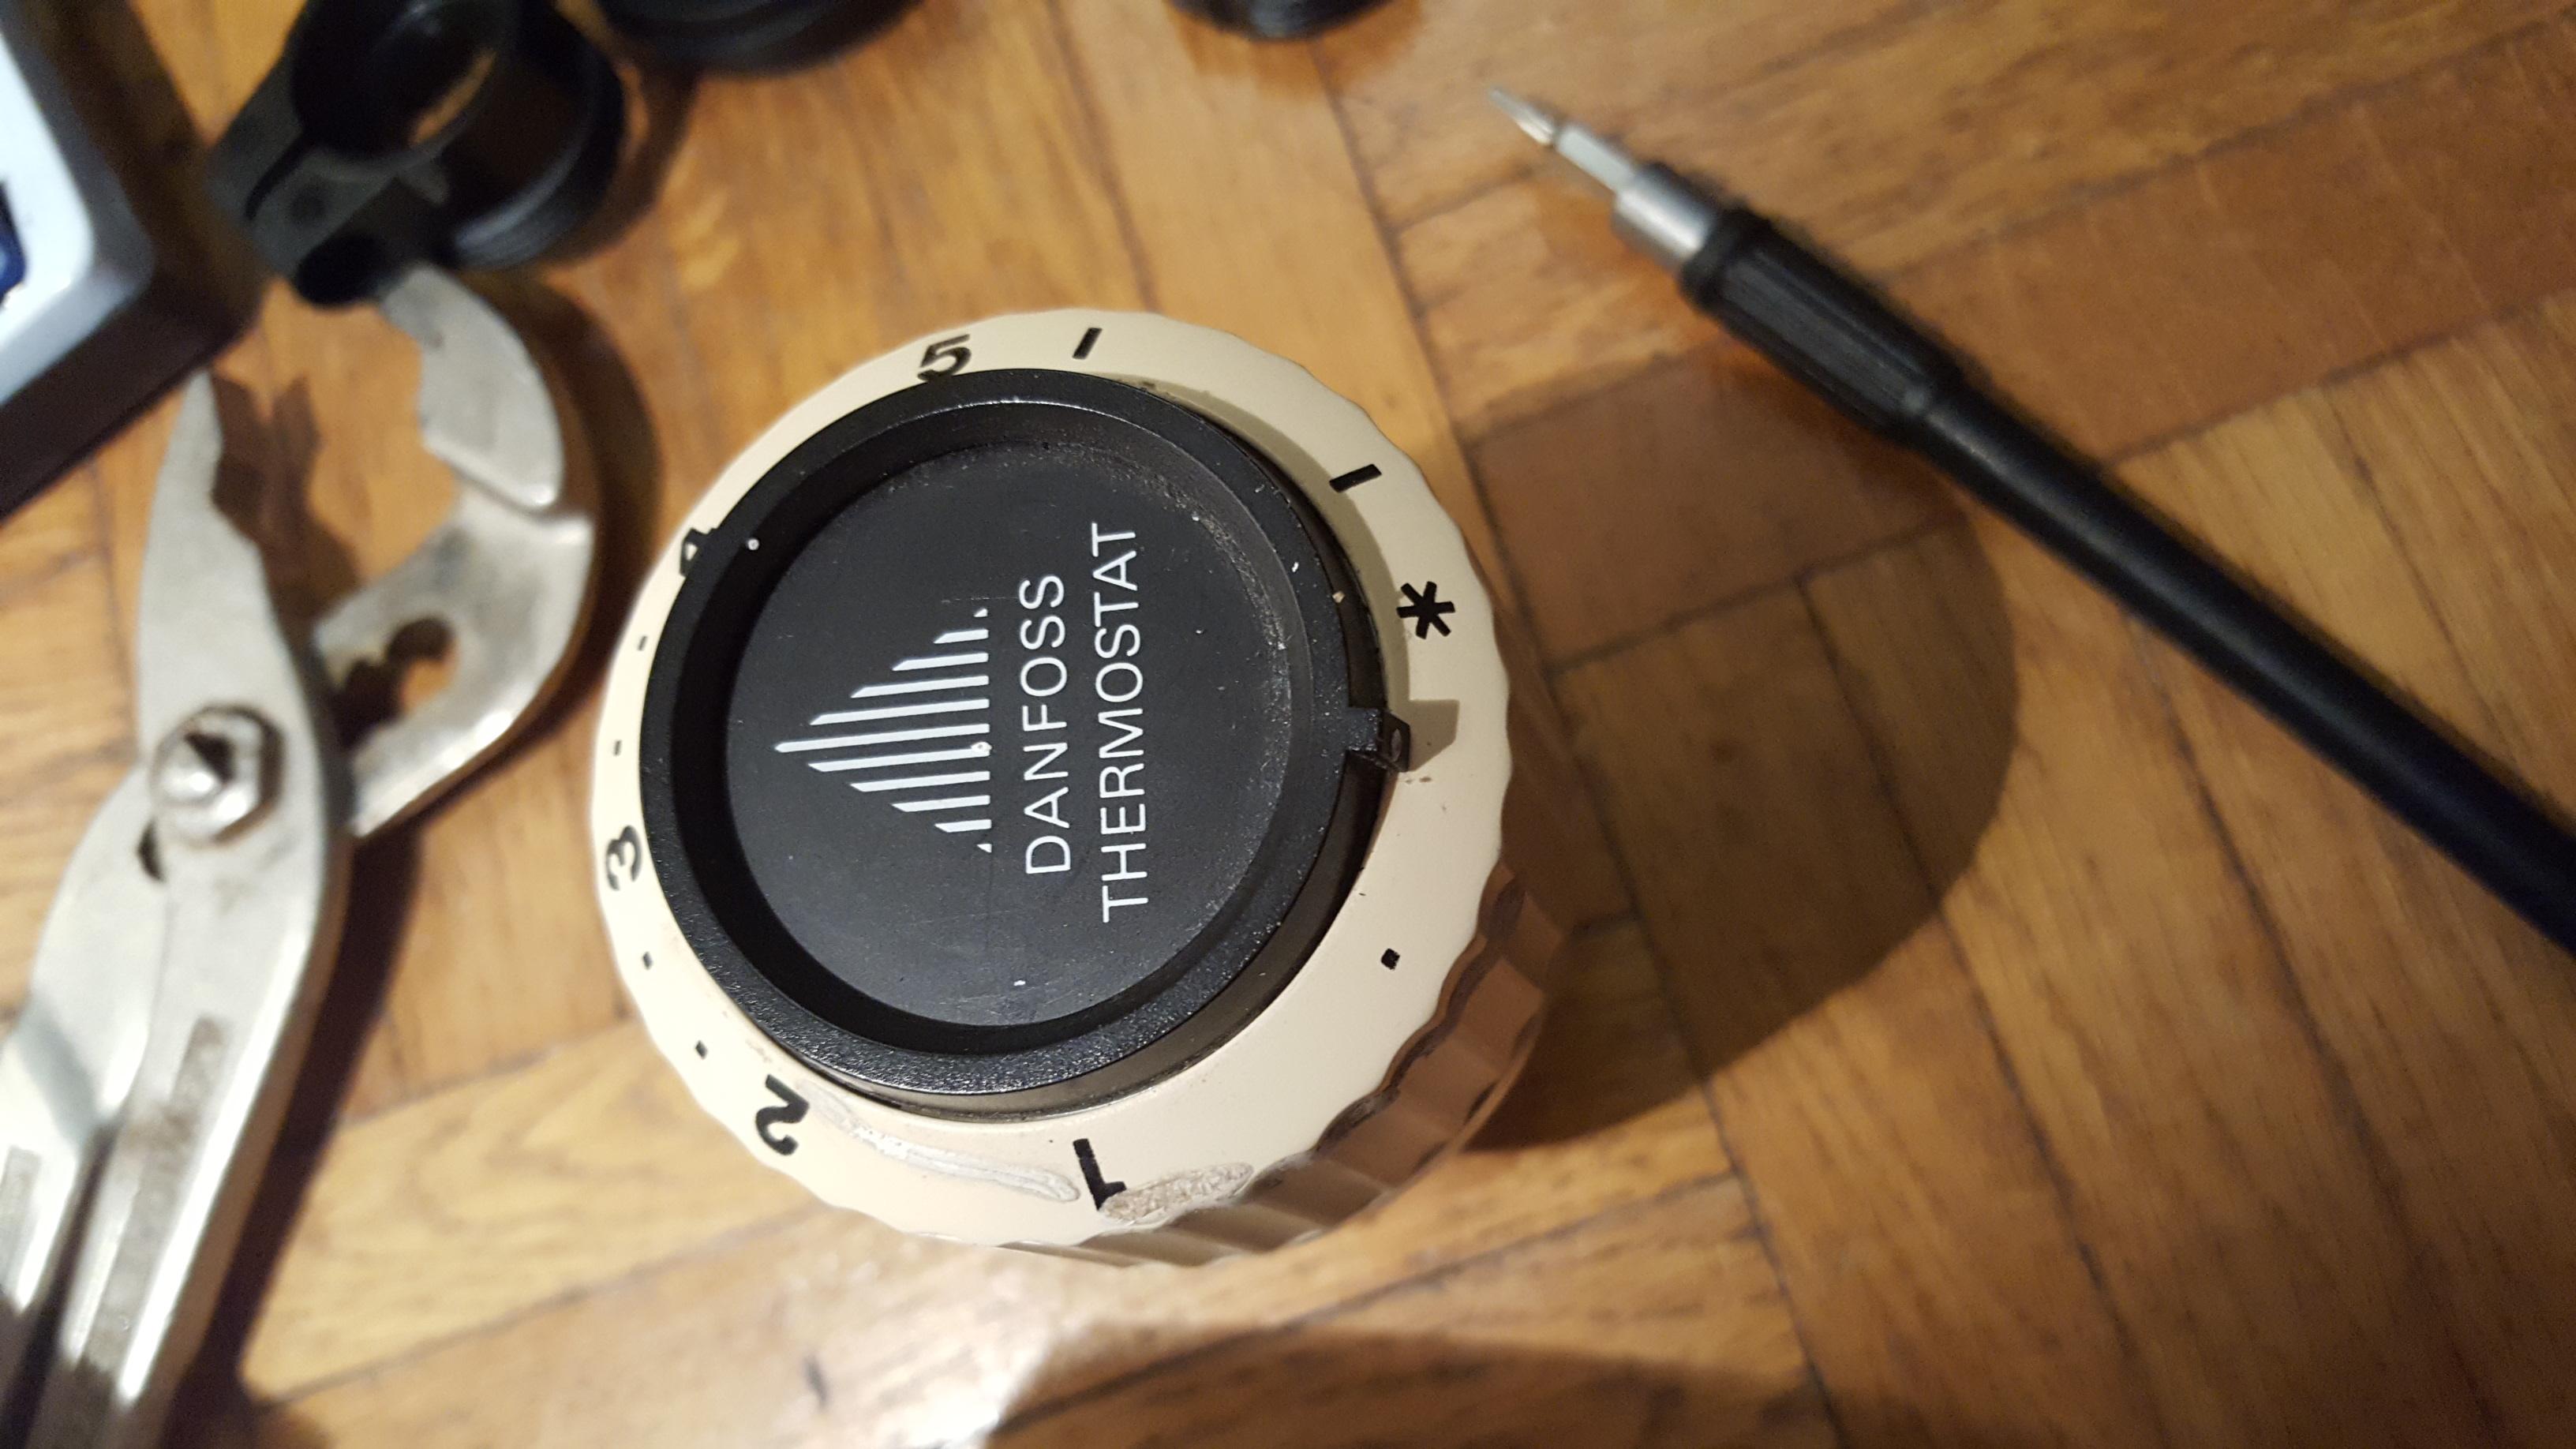 wie montiert man einen comet dect thermostat smart home danfoss. Black Bedroom Furniture Sets. Home Design Ideas